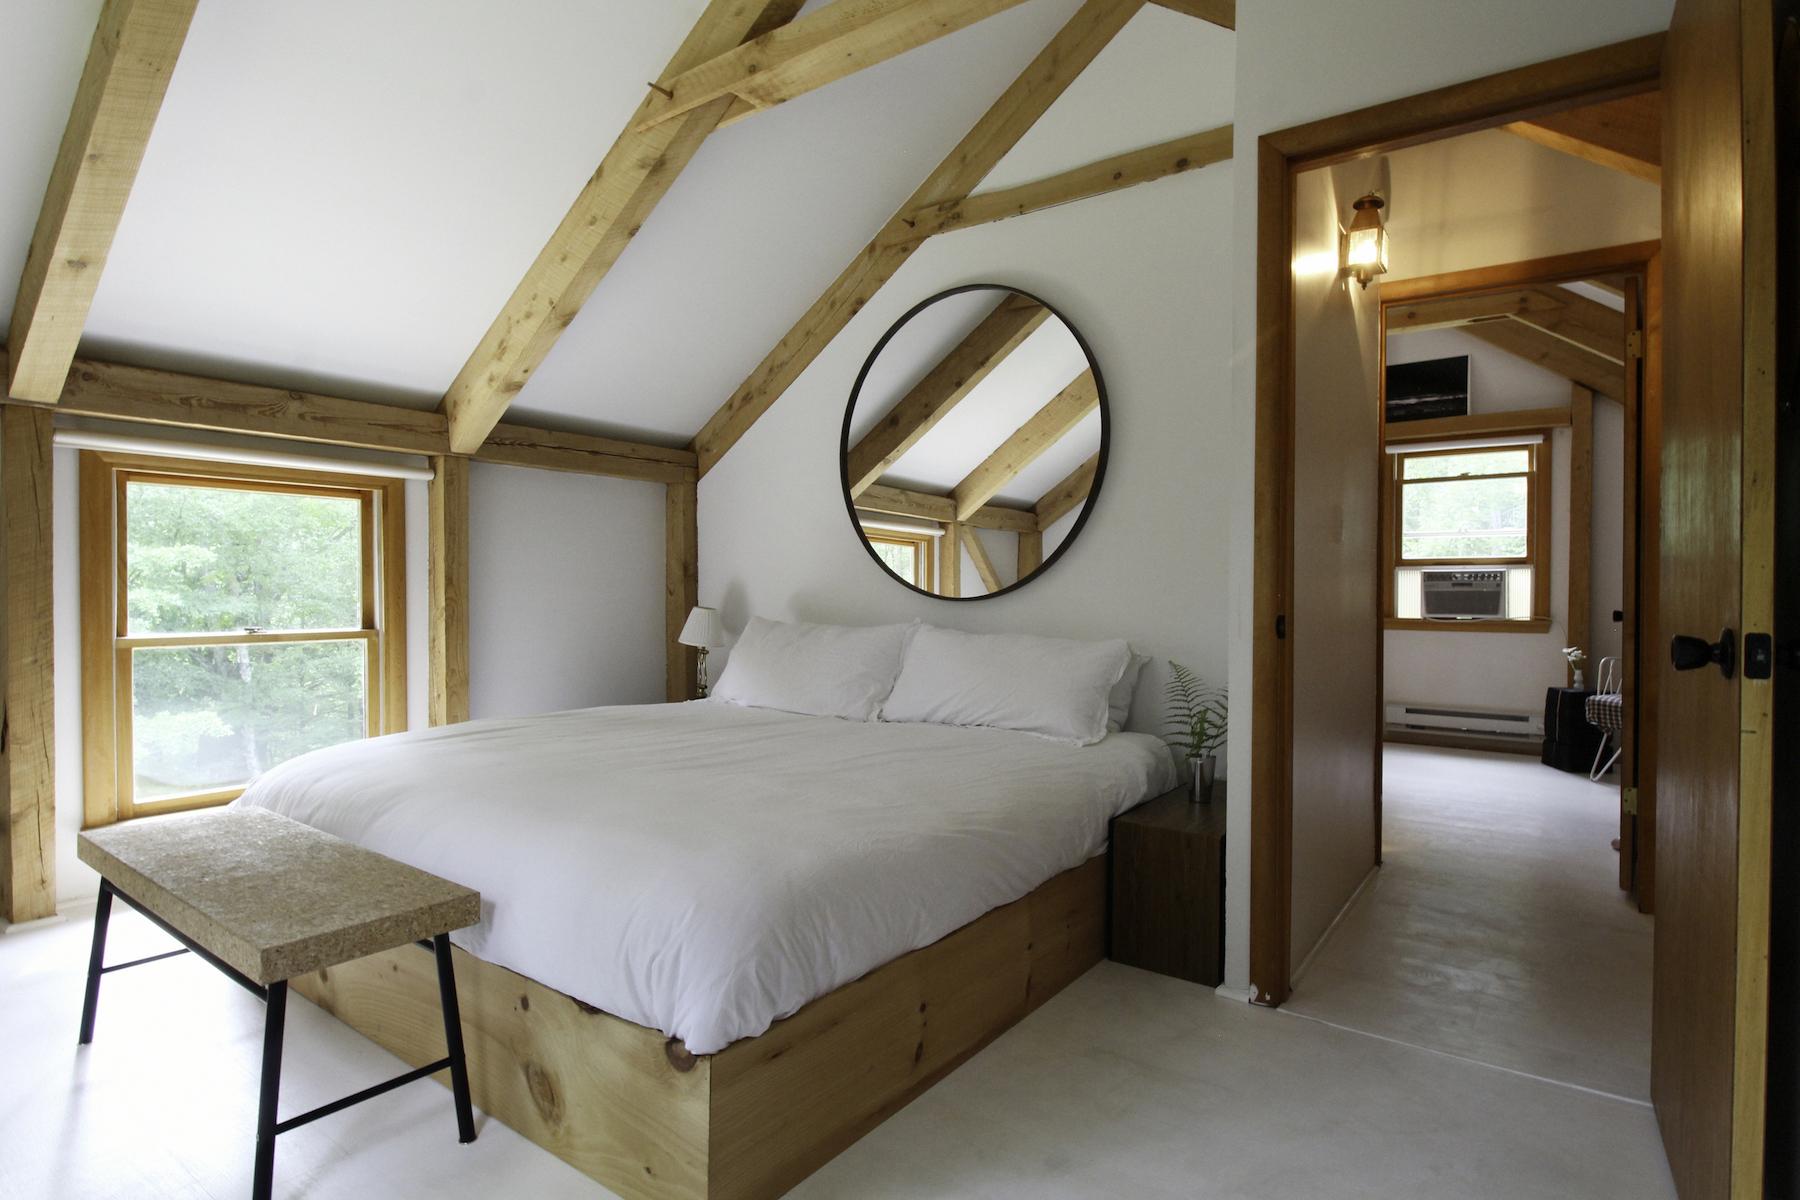 GROGKILL BEDROOM ONE 2.jpg